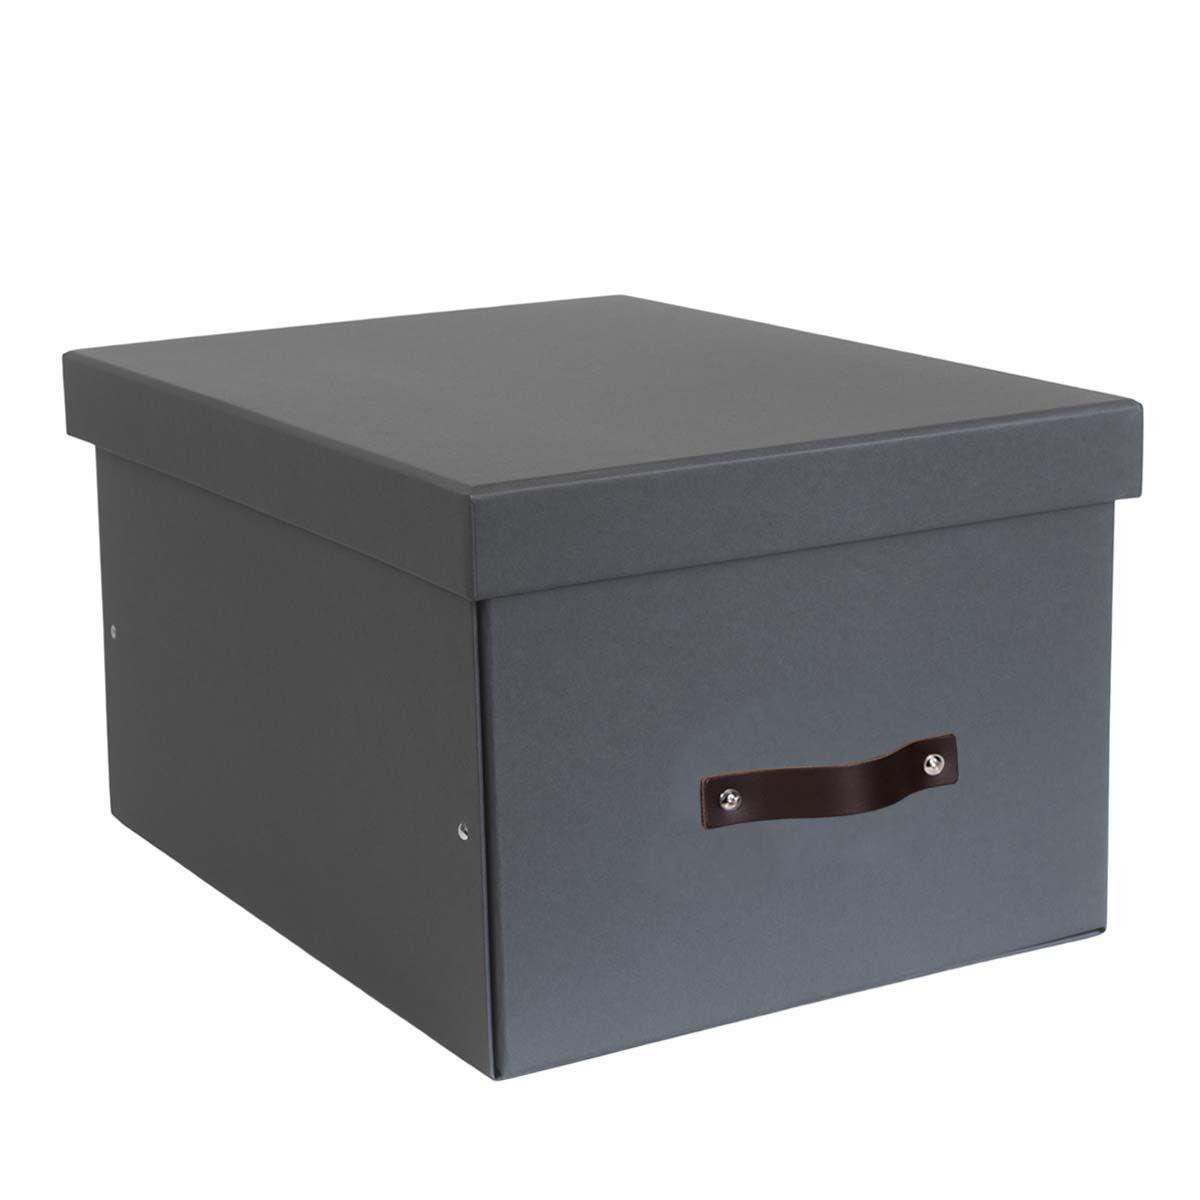 Grande boîte de rangement en carton gris - 28x38x50